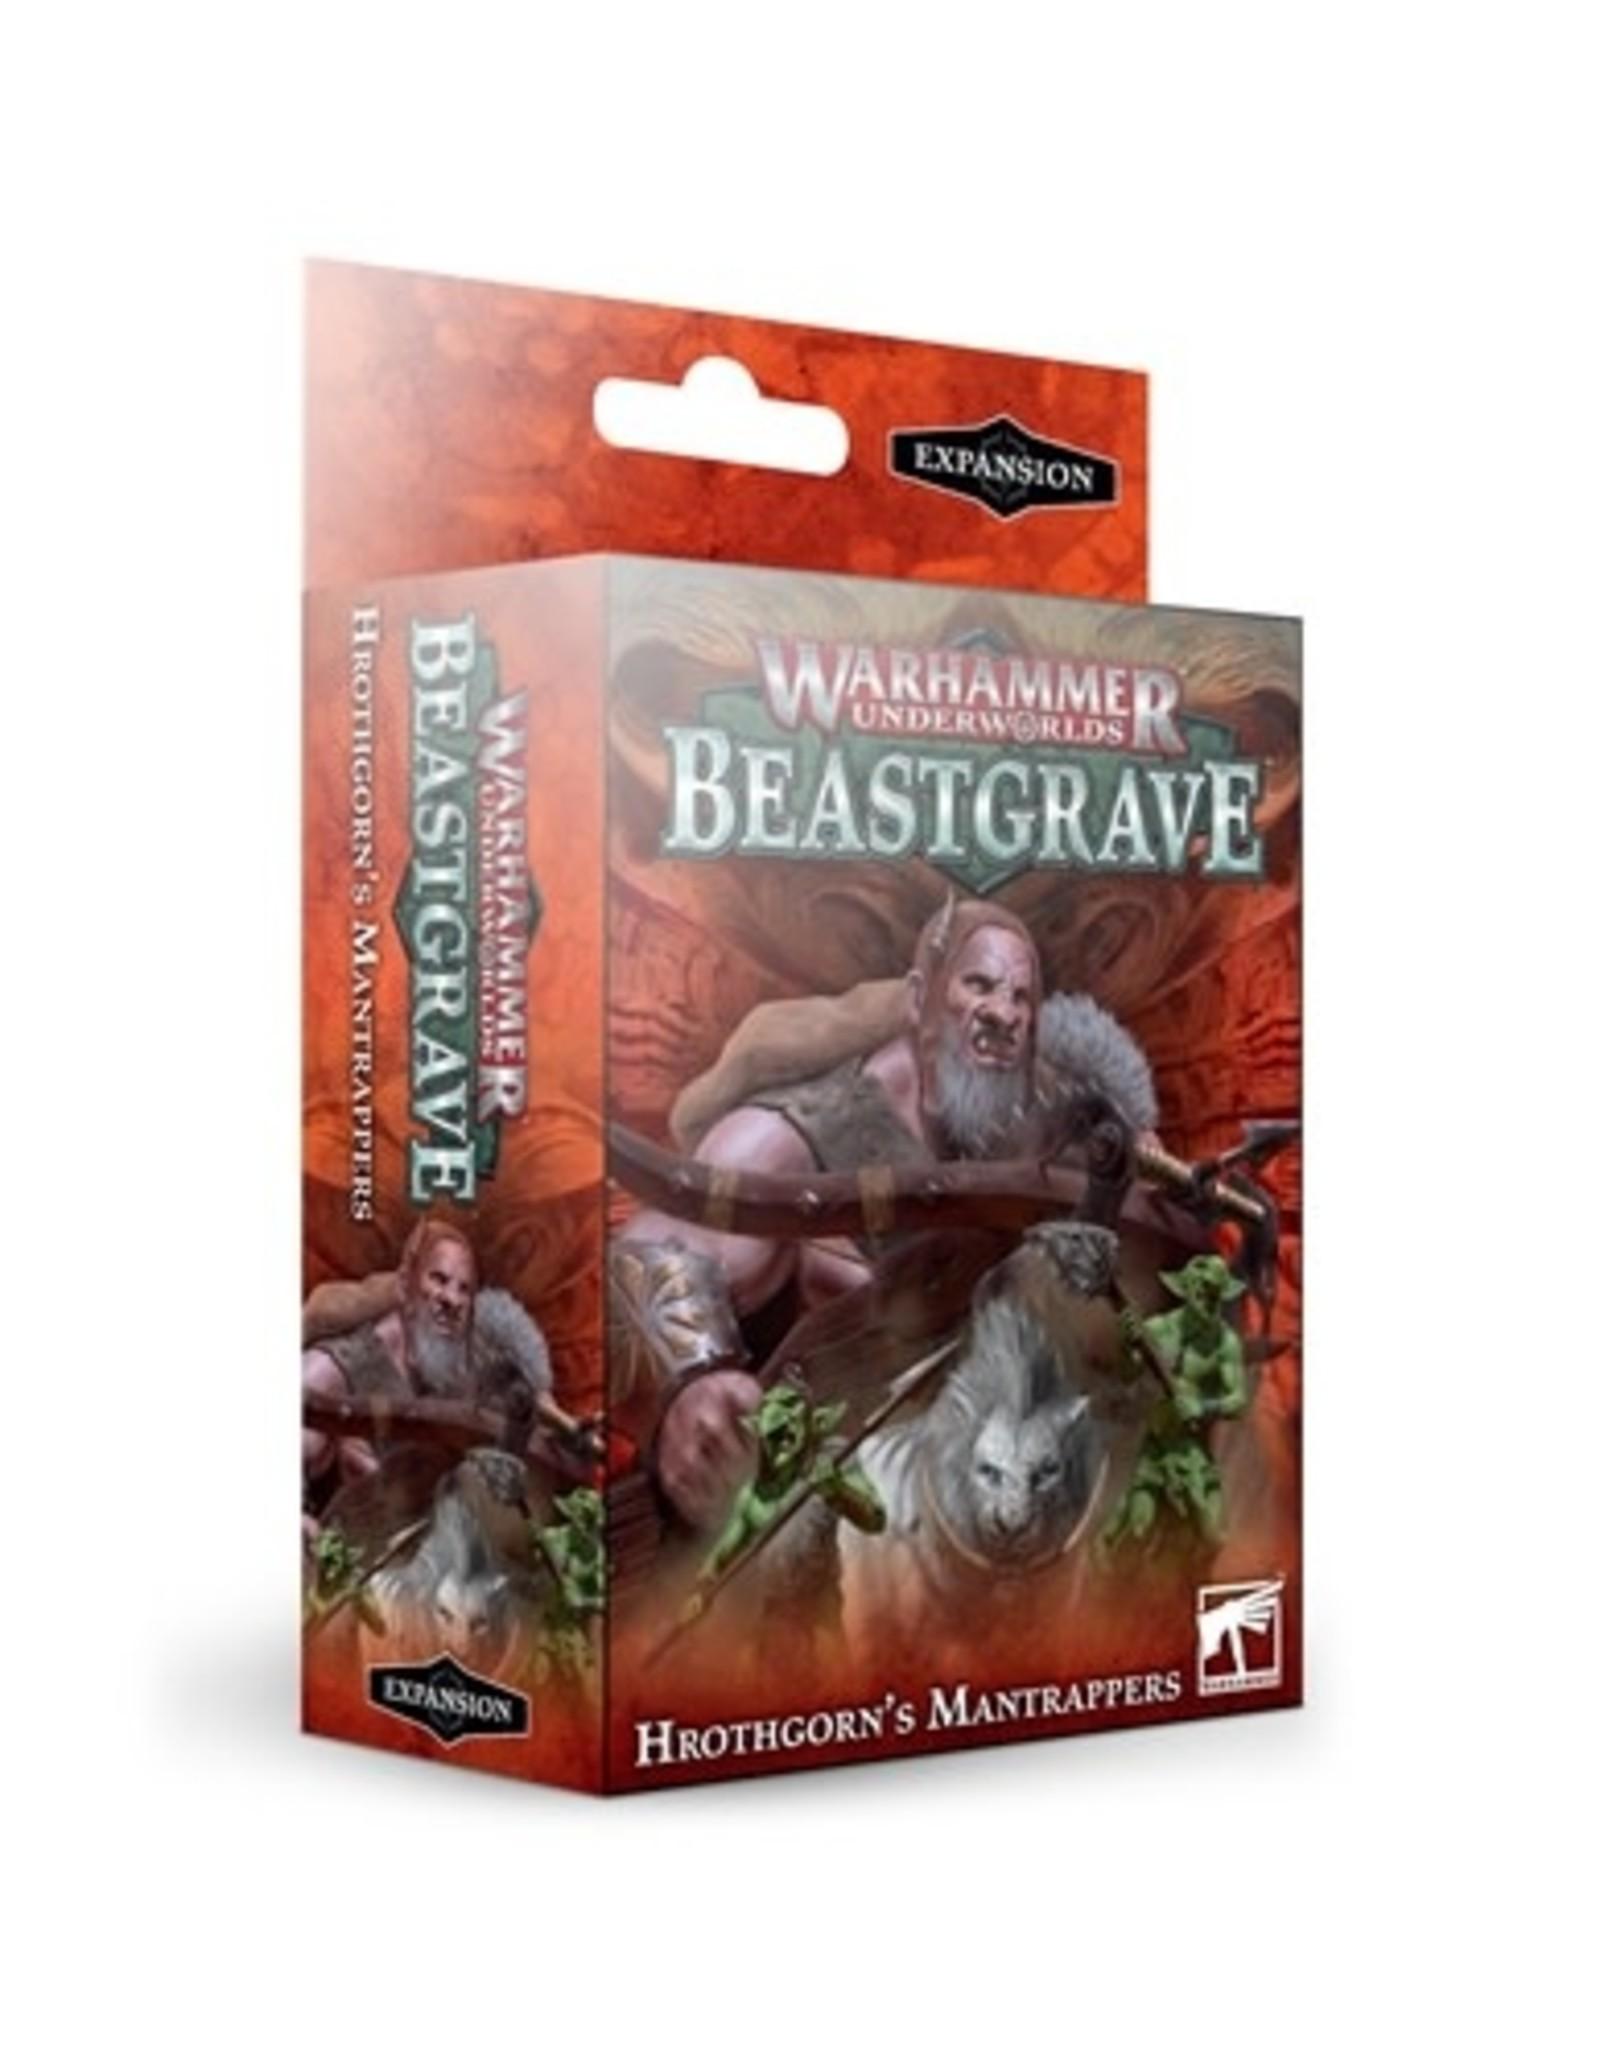 Games-Workshop Whu: Hrothgorn's Mantrappers (ENGLISH)